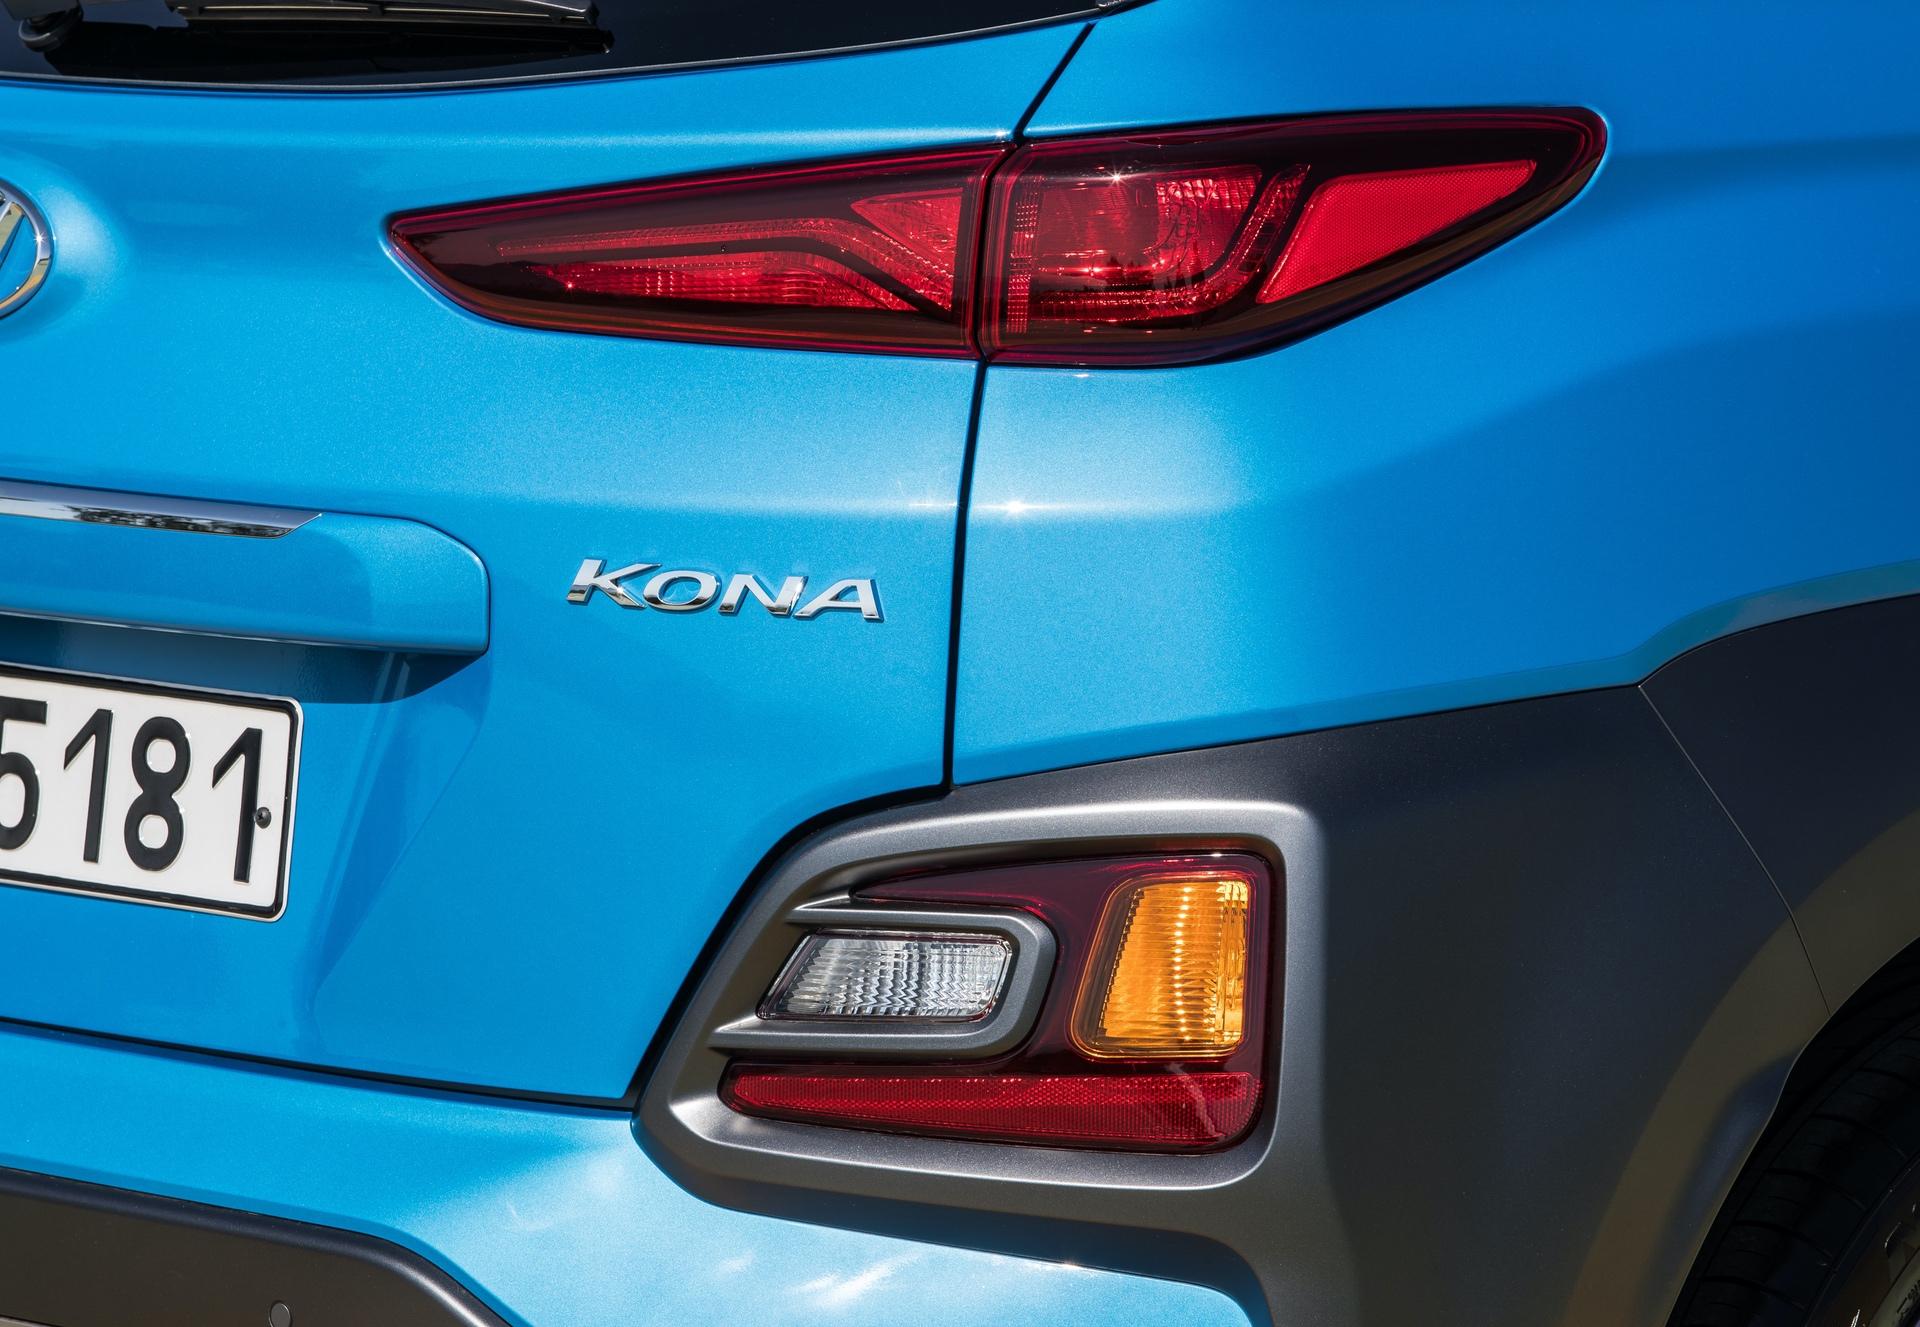 Hyundai_Kona_greek_presskit_0084